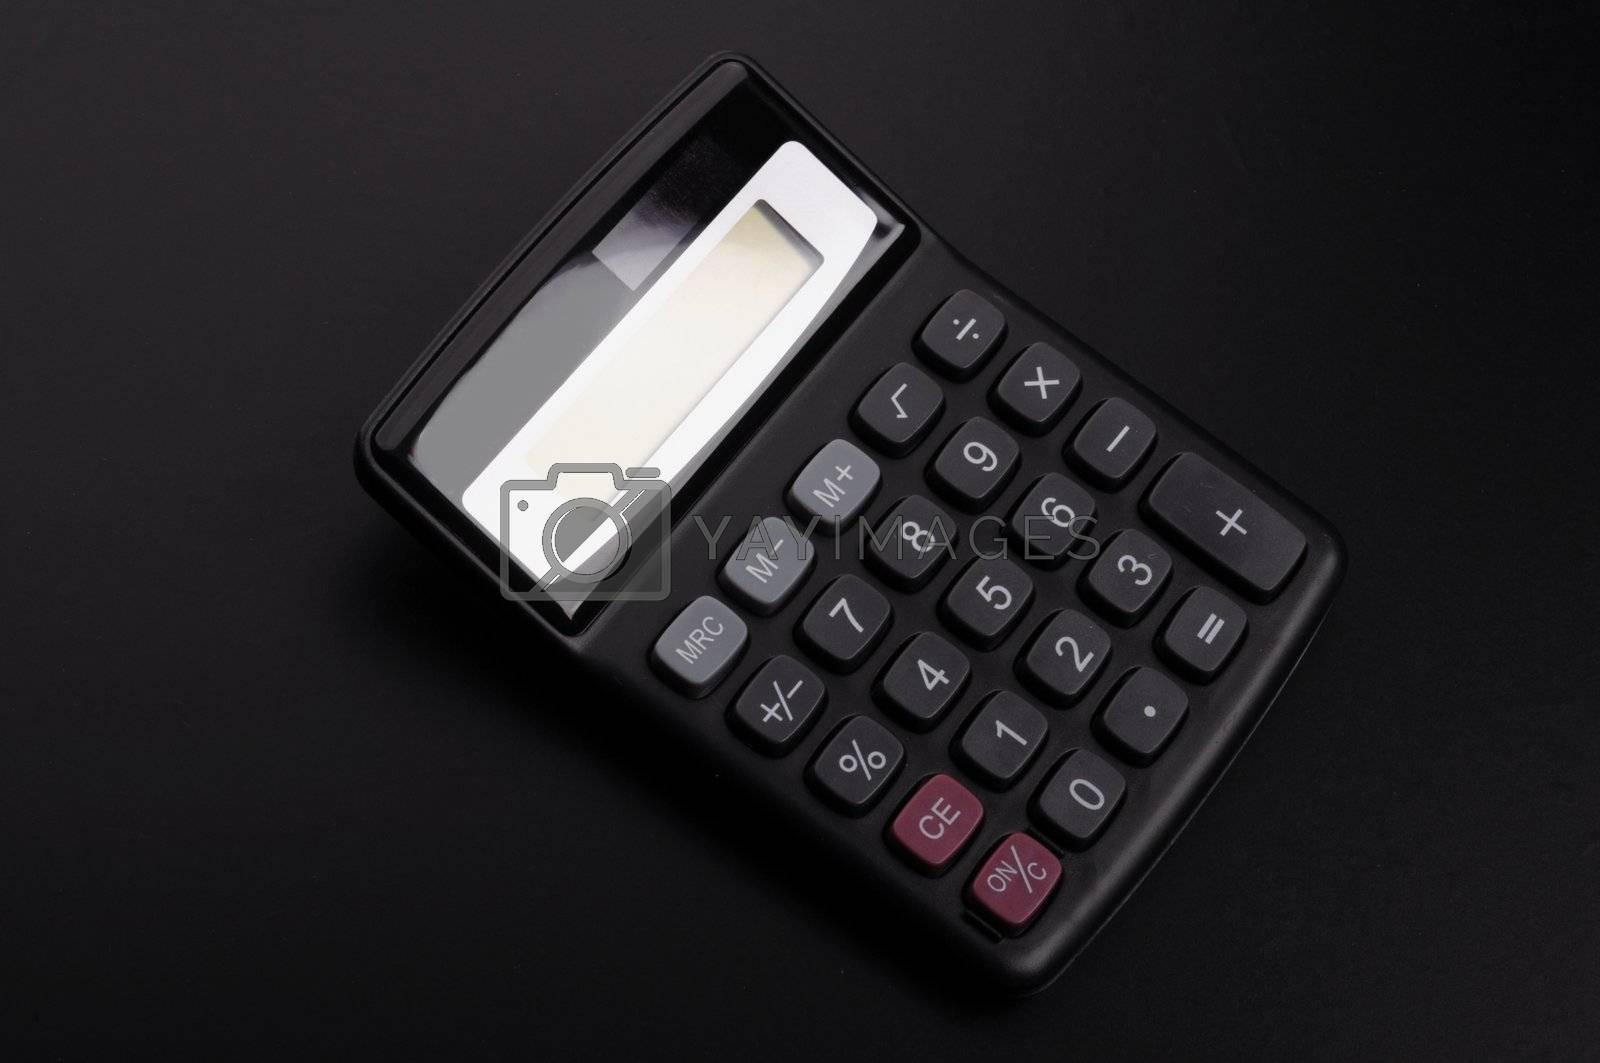 Royalty free image of calculator by gunnar3000